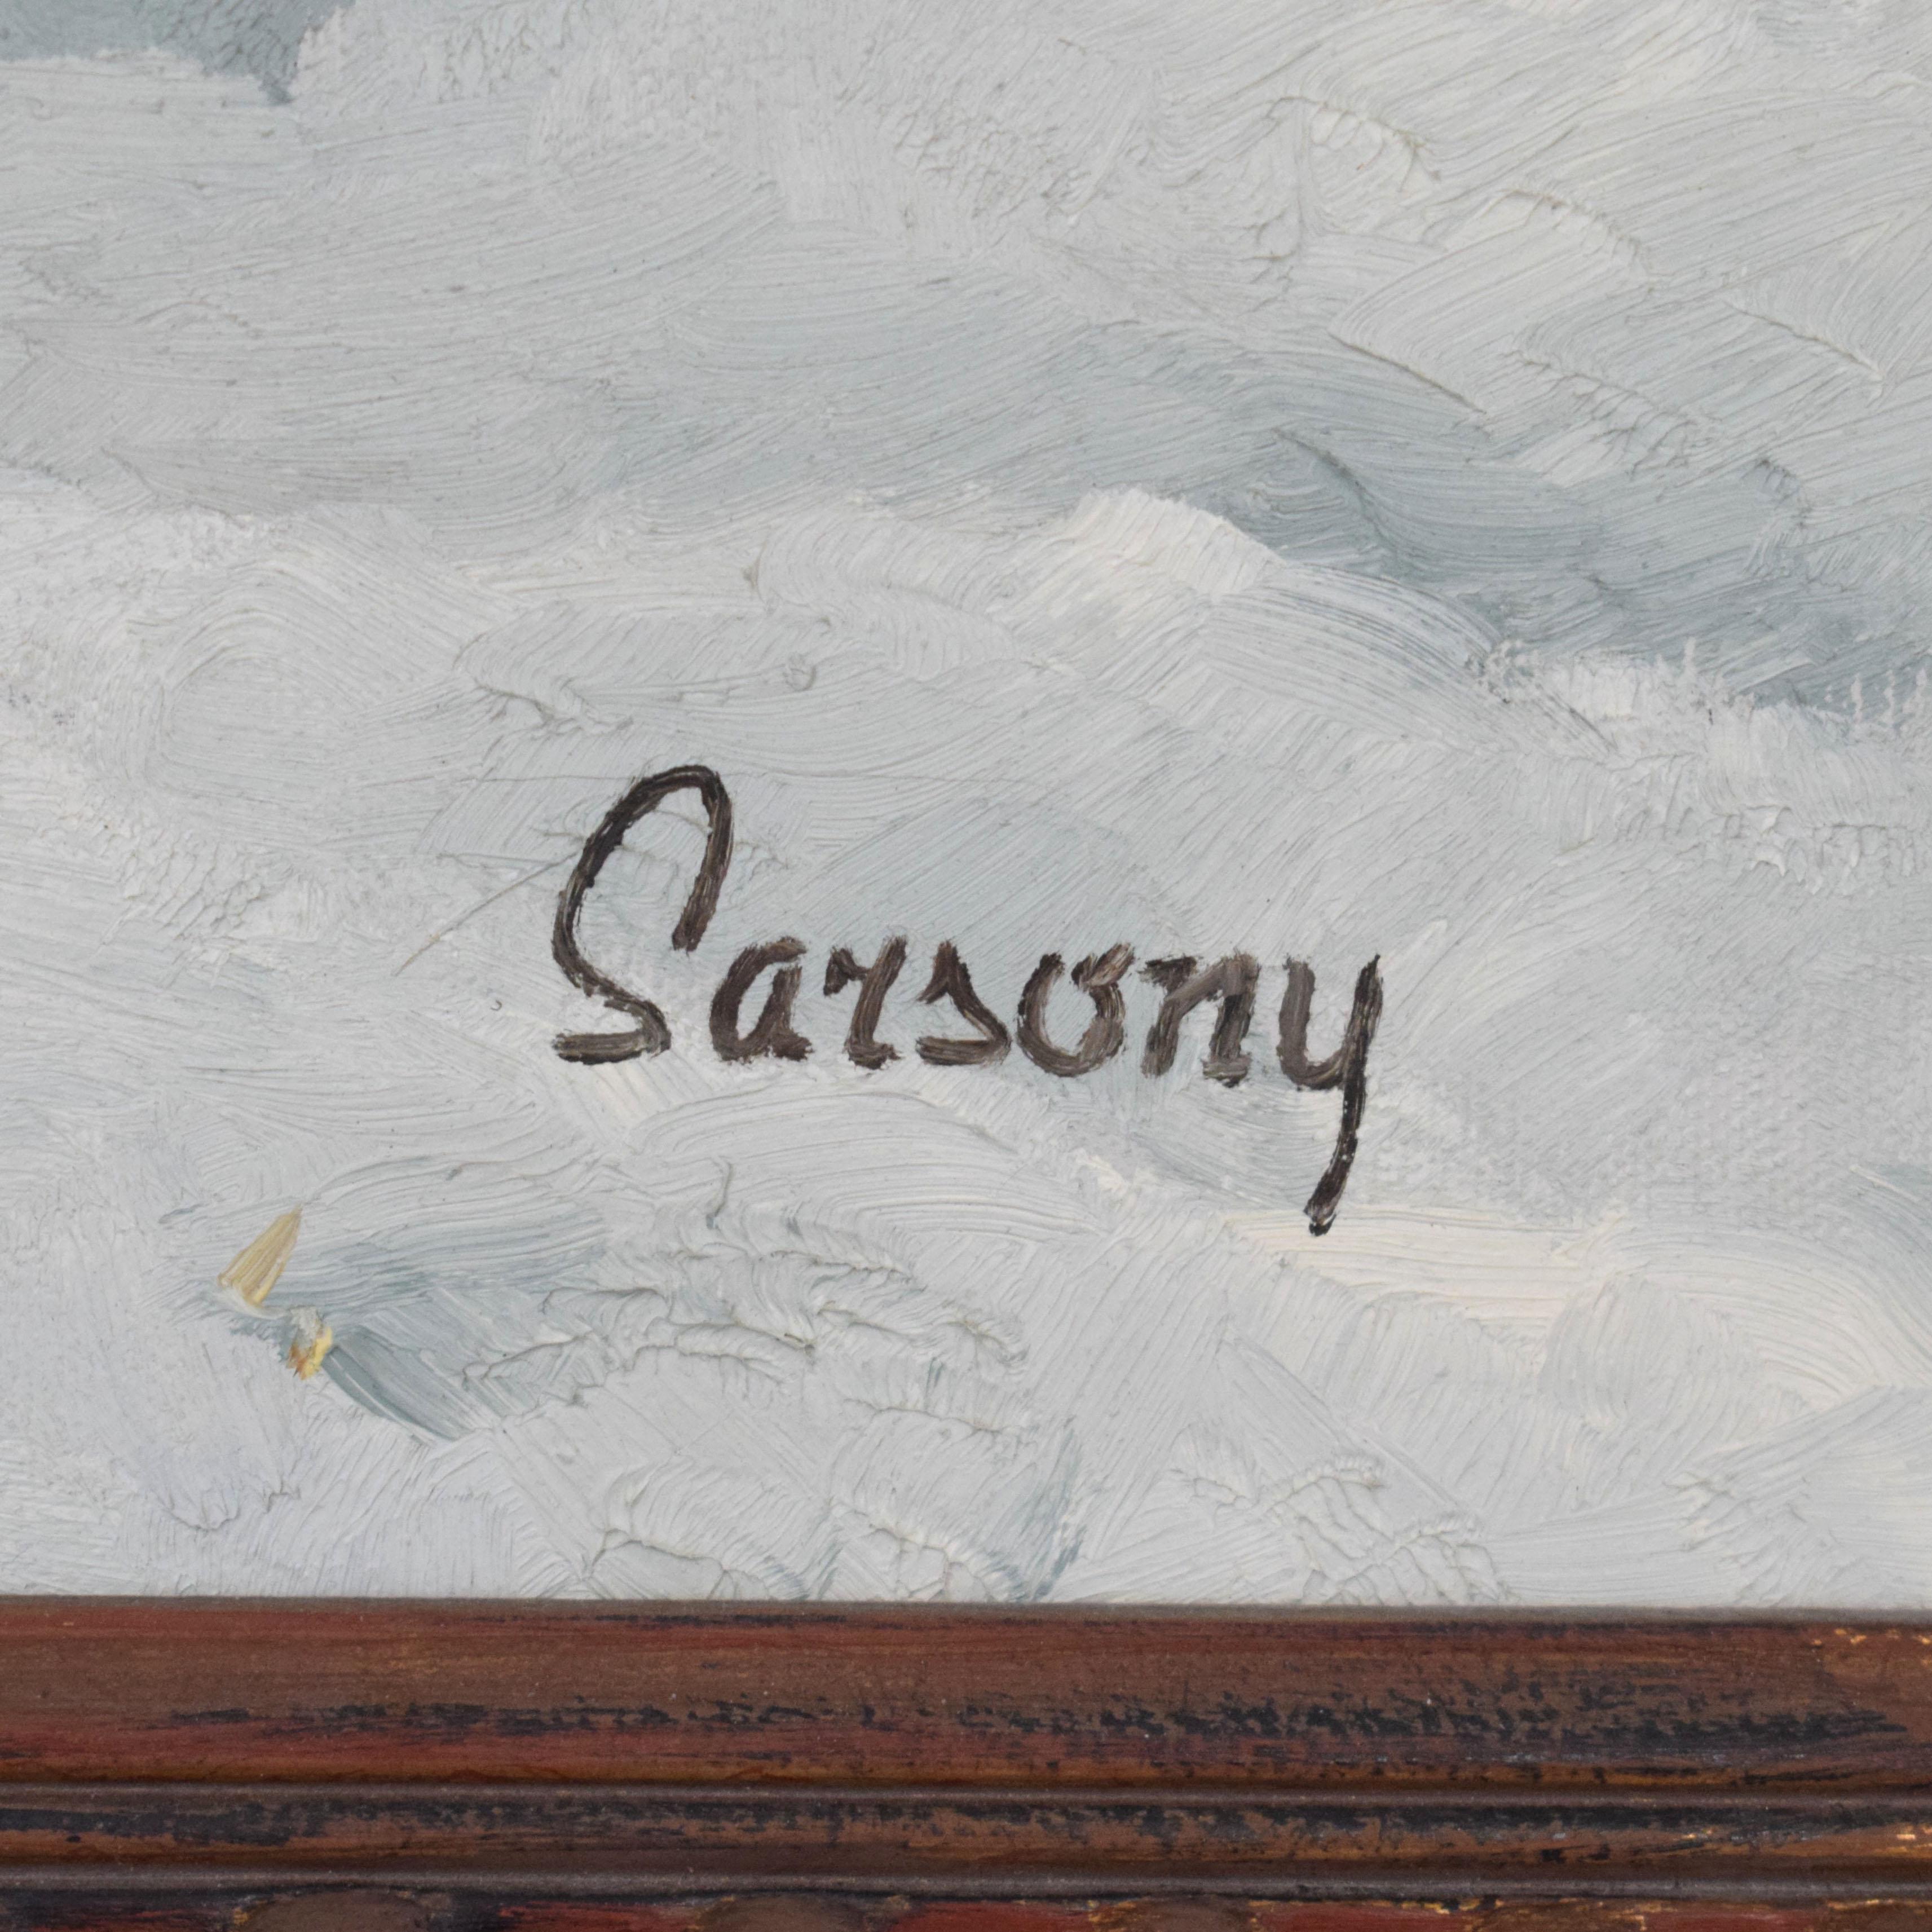 Robert Sarsony The Field Wagon c1964 dimensions